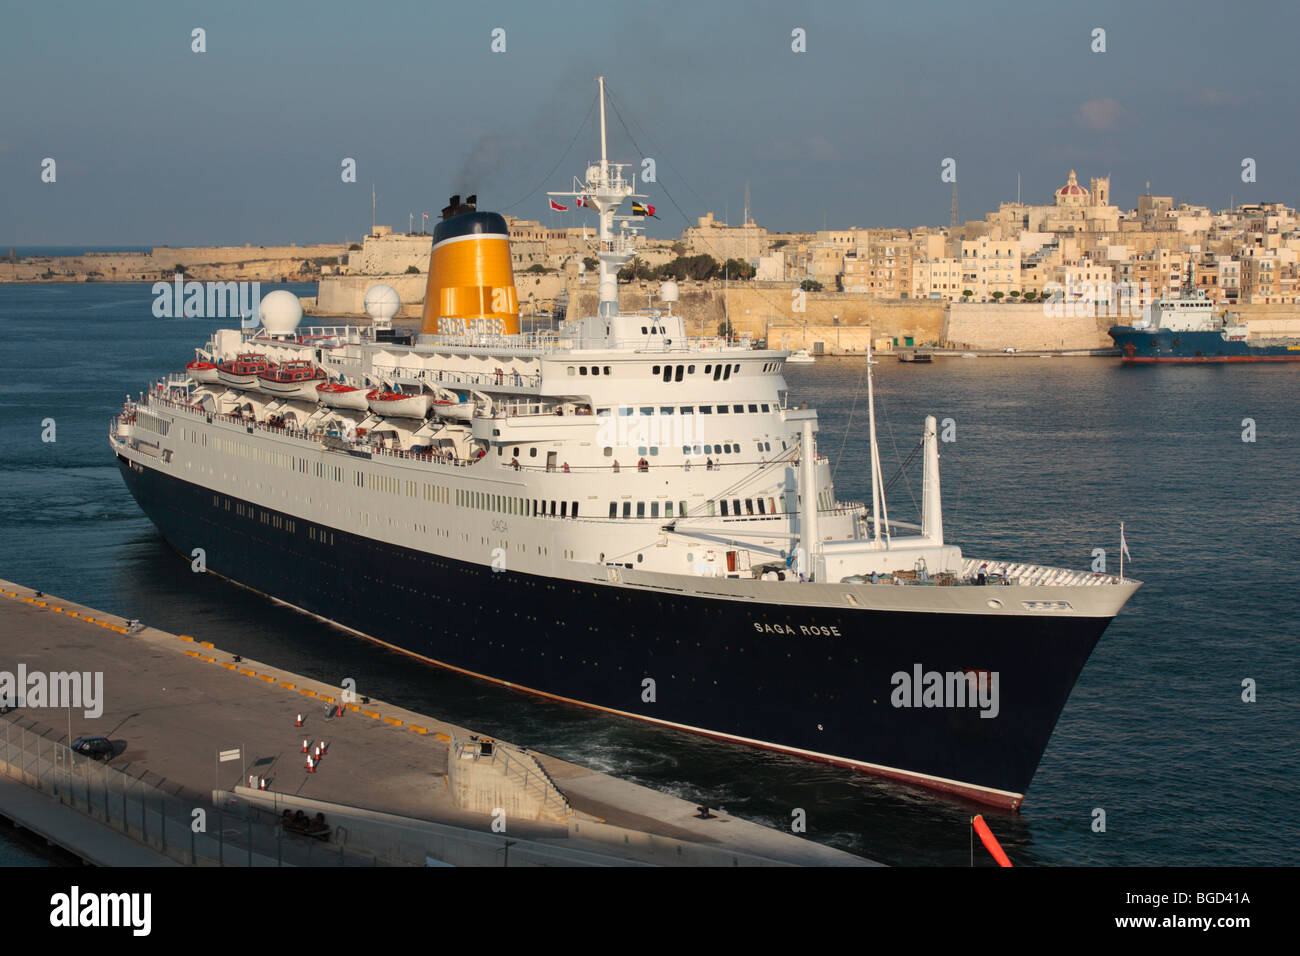 Mediterranean travel and tourism. The cruise liner Saga Rose leaving Malta's Grand Harbour - Stock Image